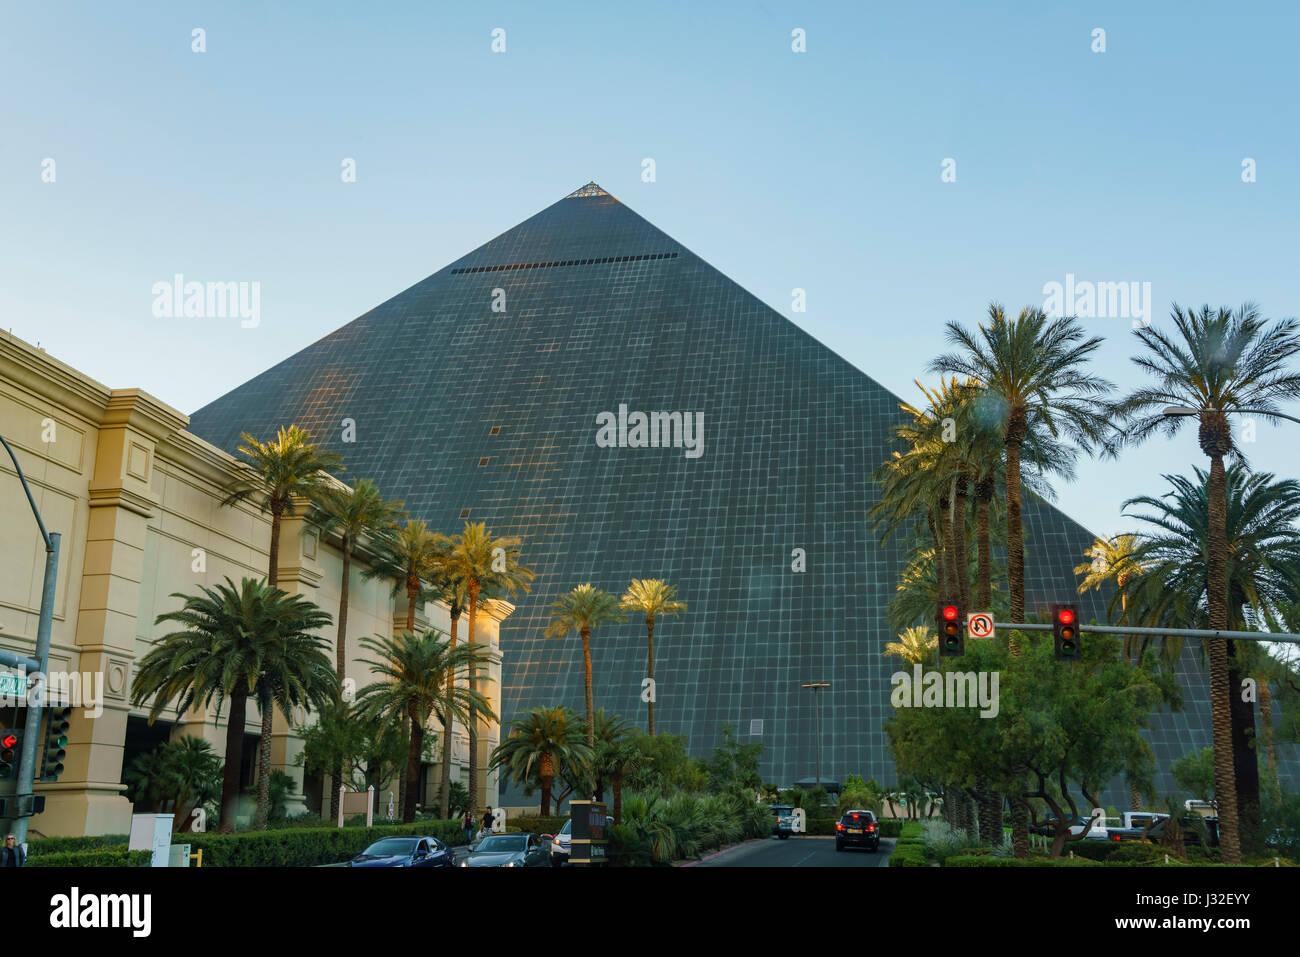 The Big Pyramid Of Luxor Hotel Casino Las Vegas Nevada Stock